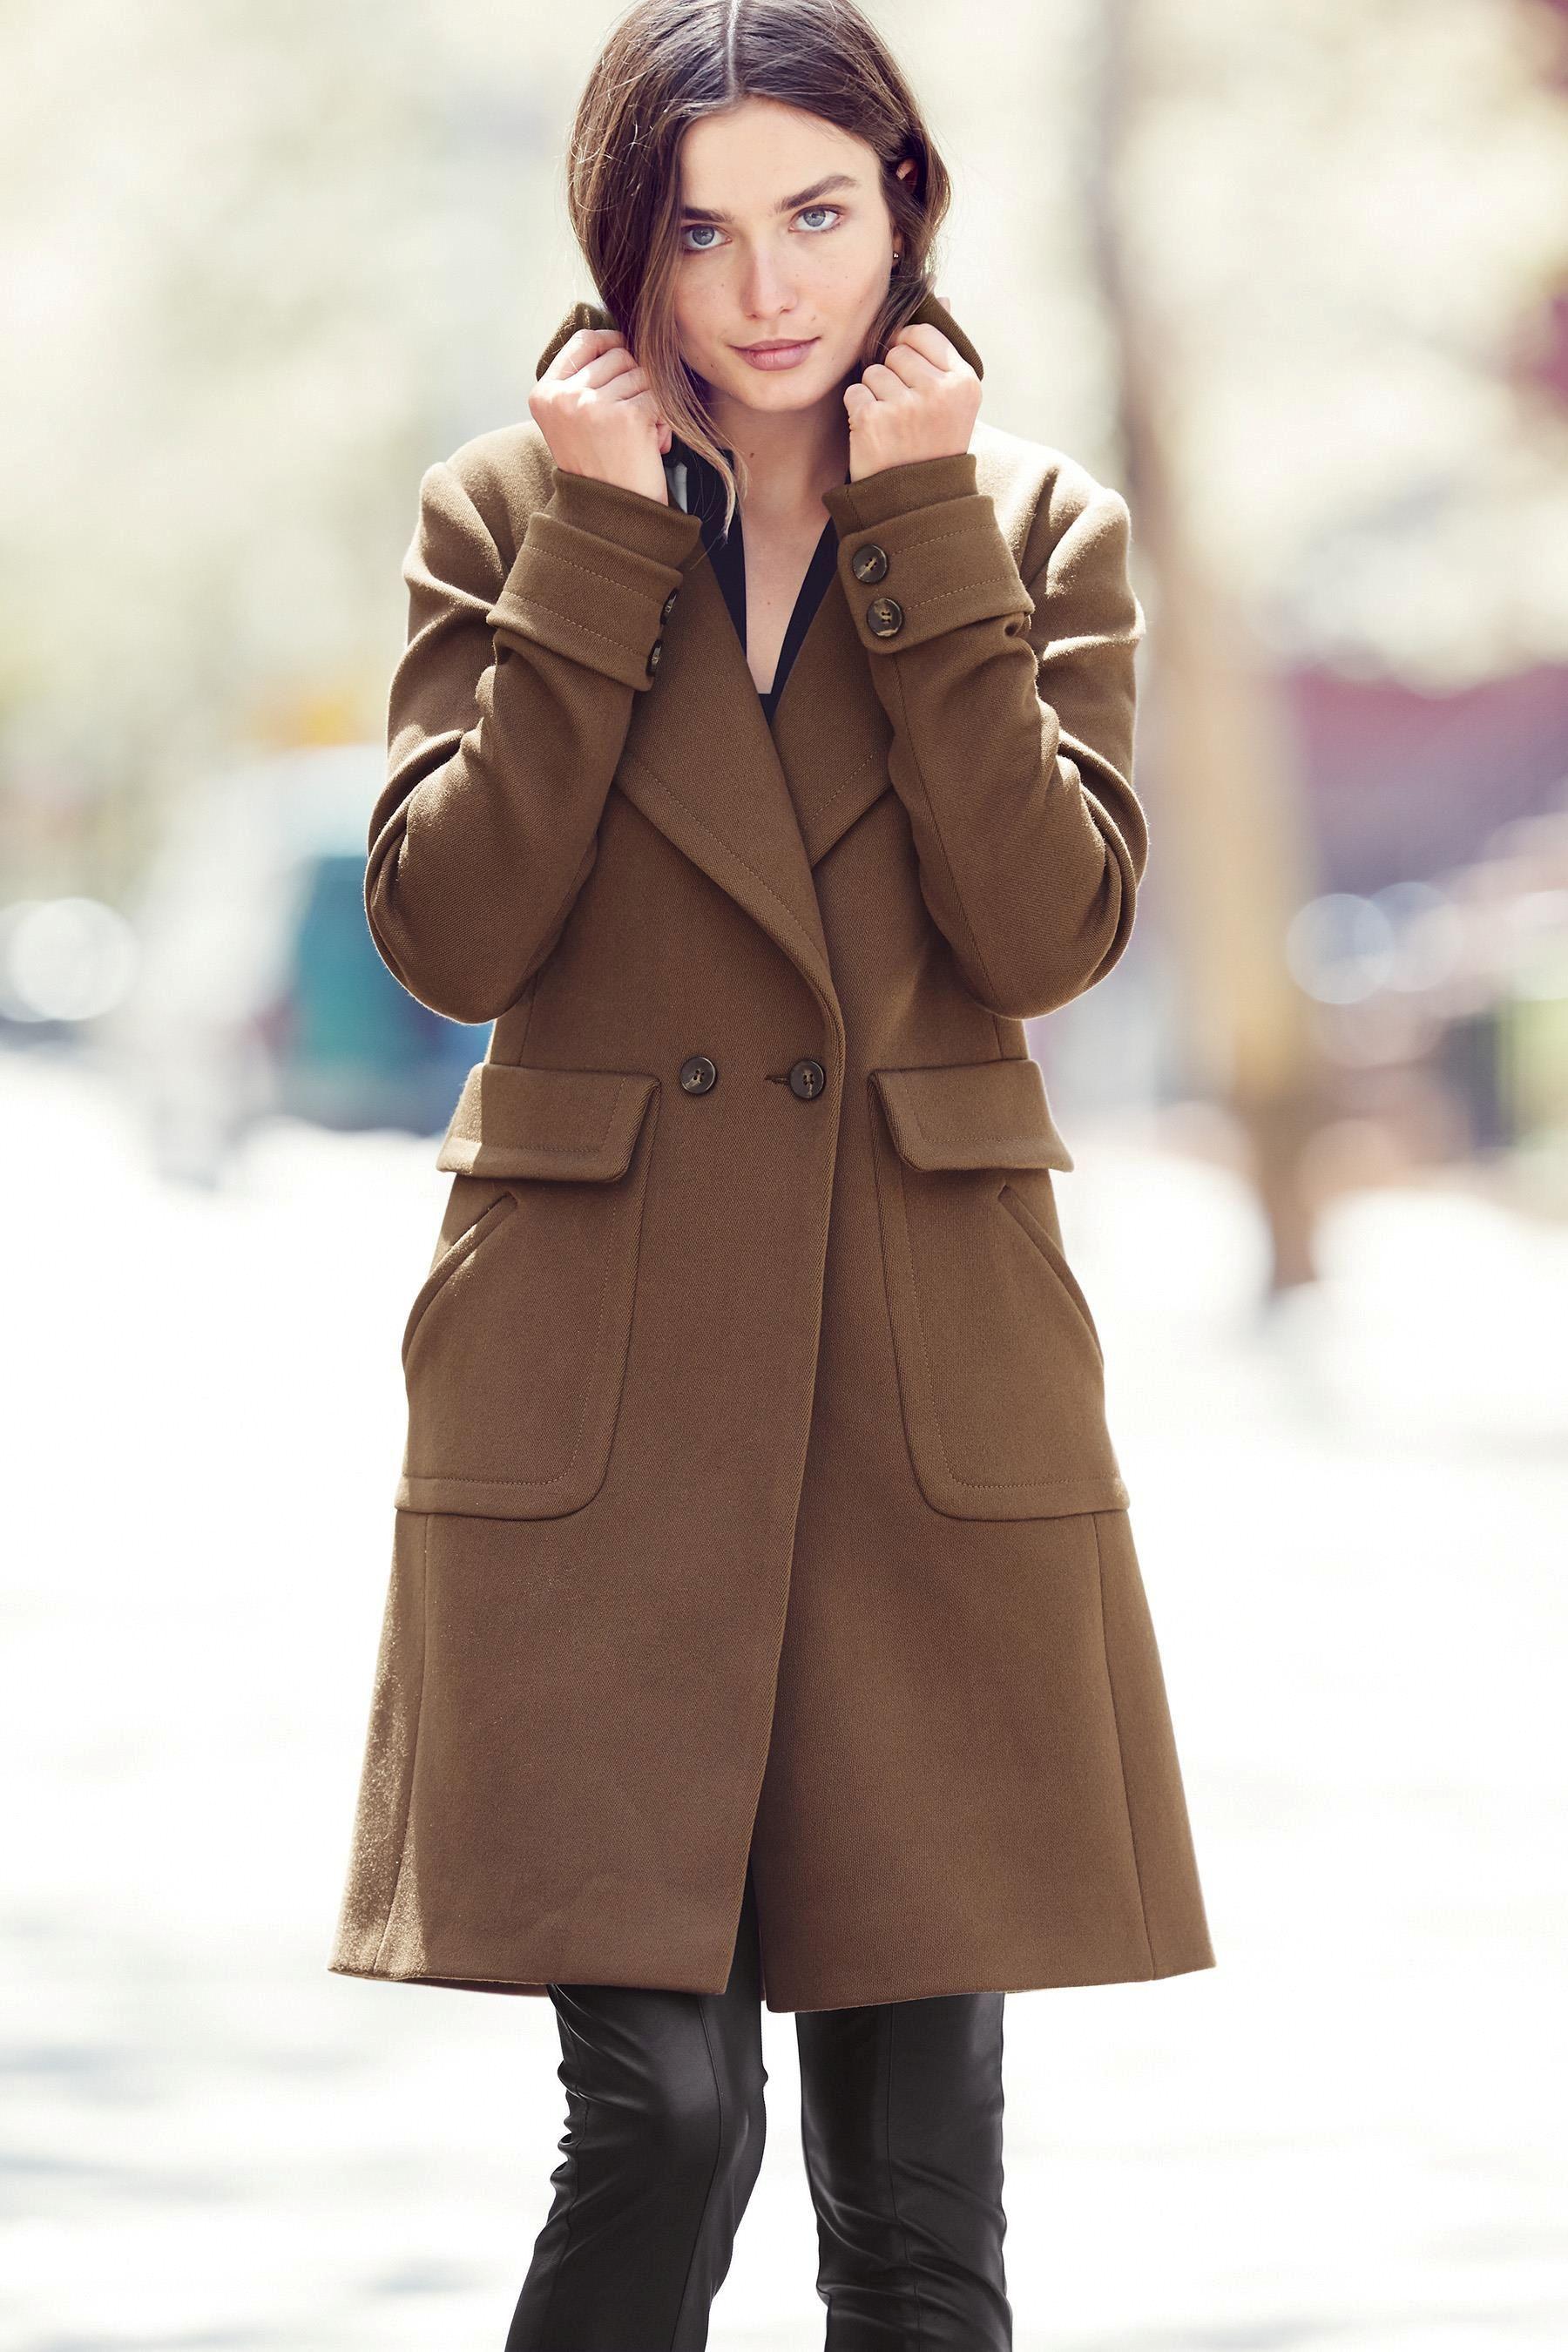 Best winter coats for 2015